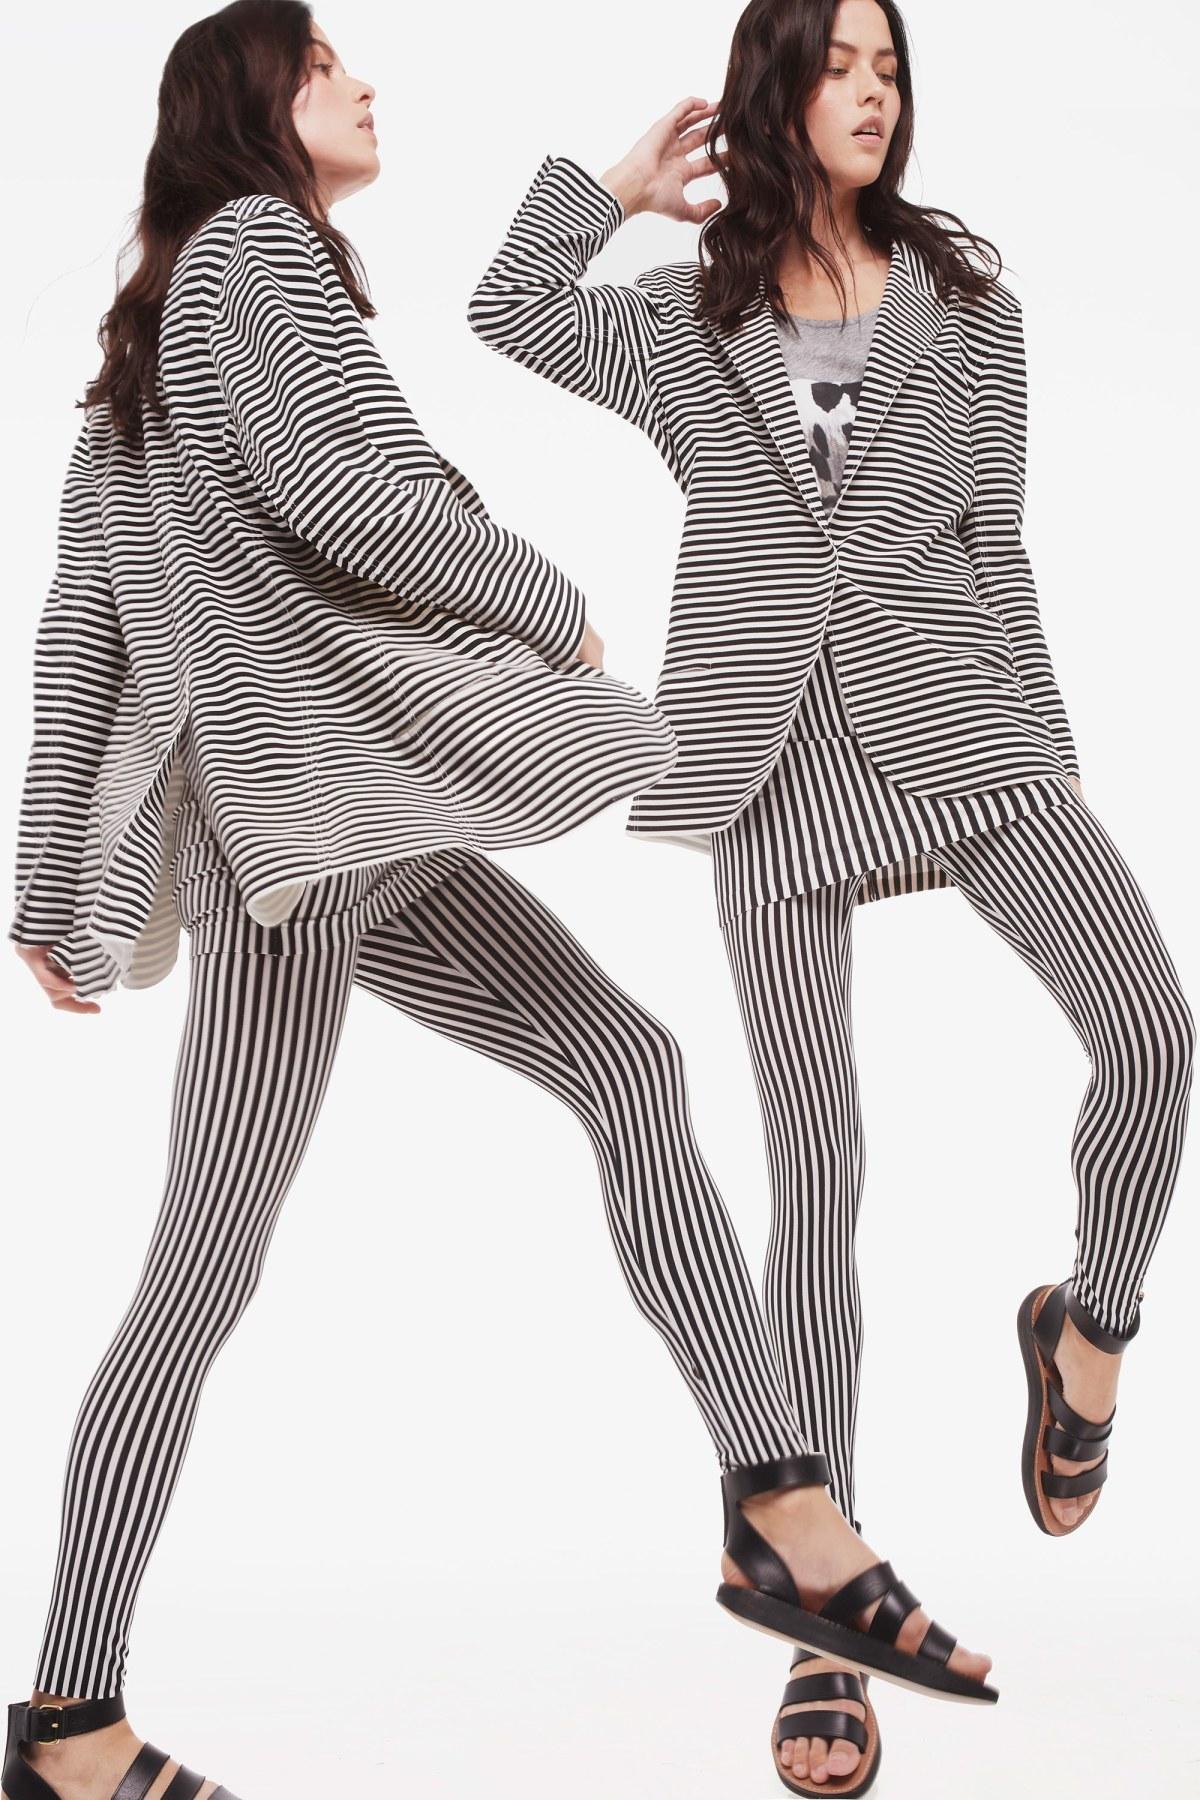 norma-kamali-pre-fall-2017-fashion-show-the-impression-05